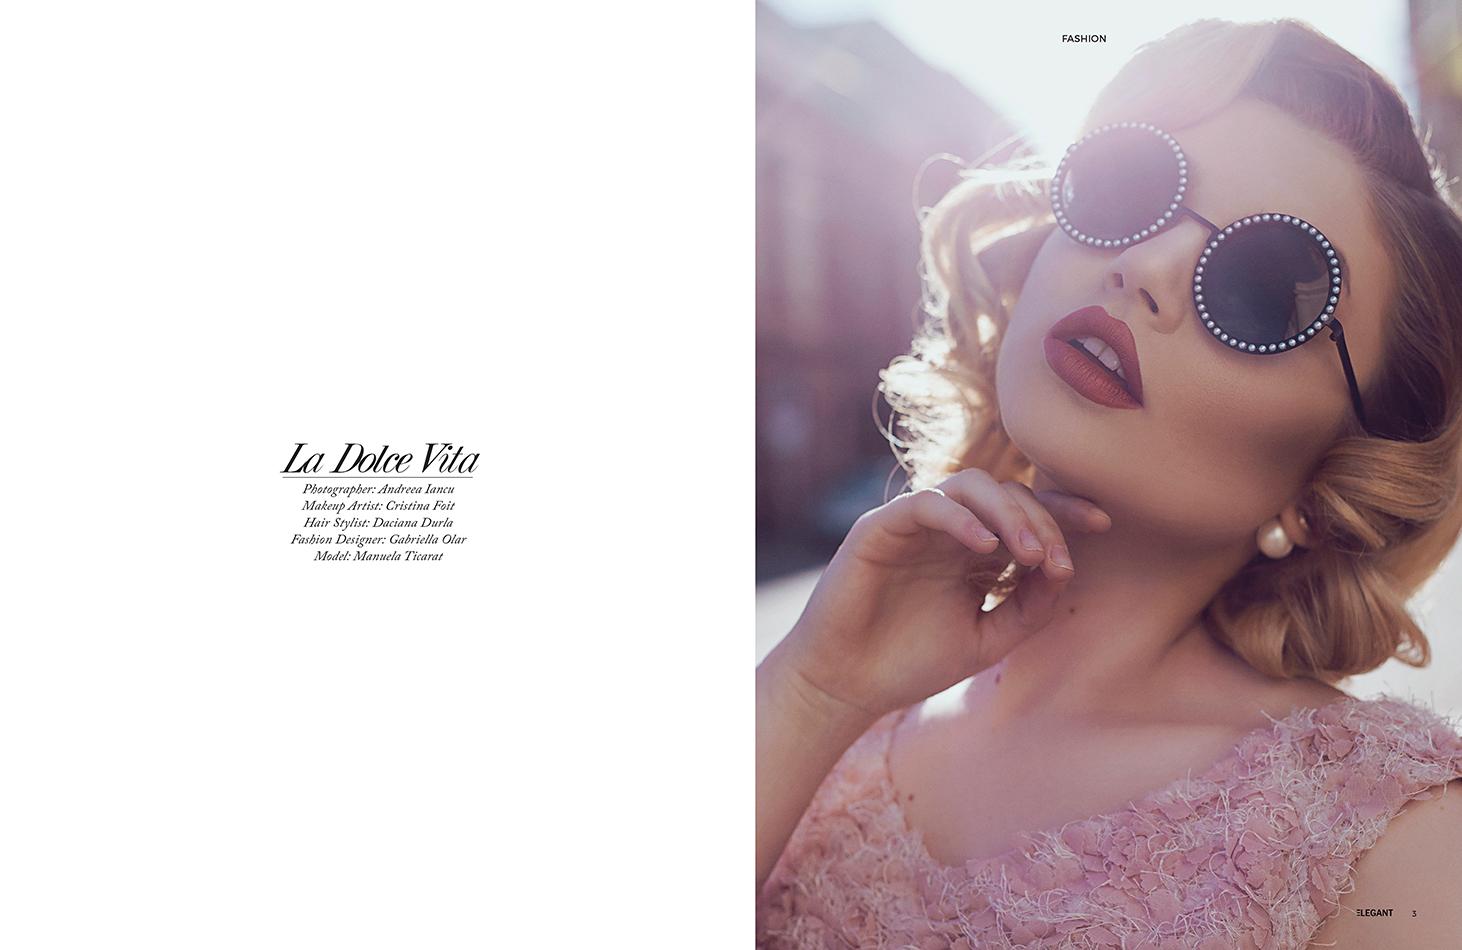 andreea-iancu-elegant-magazine-may-2017-1